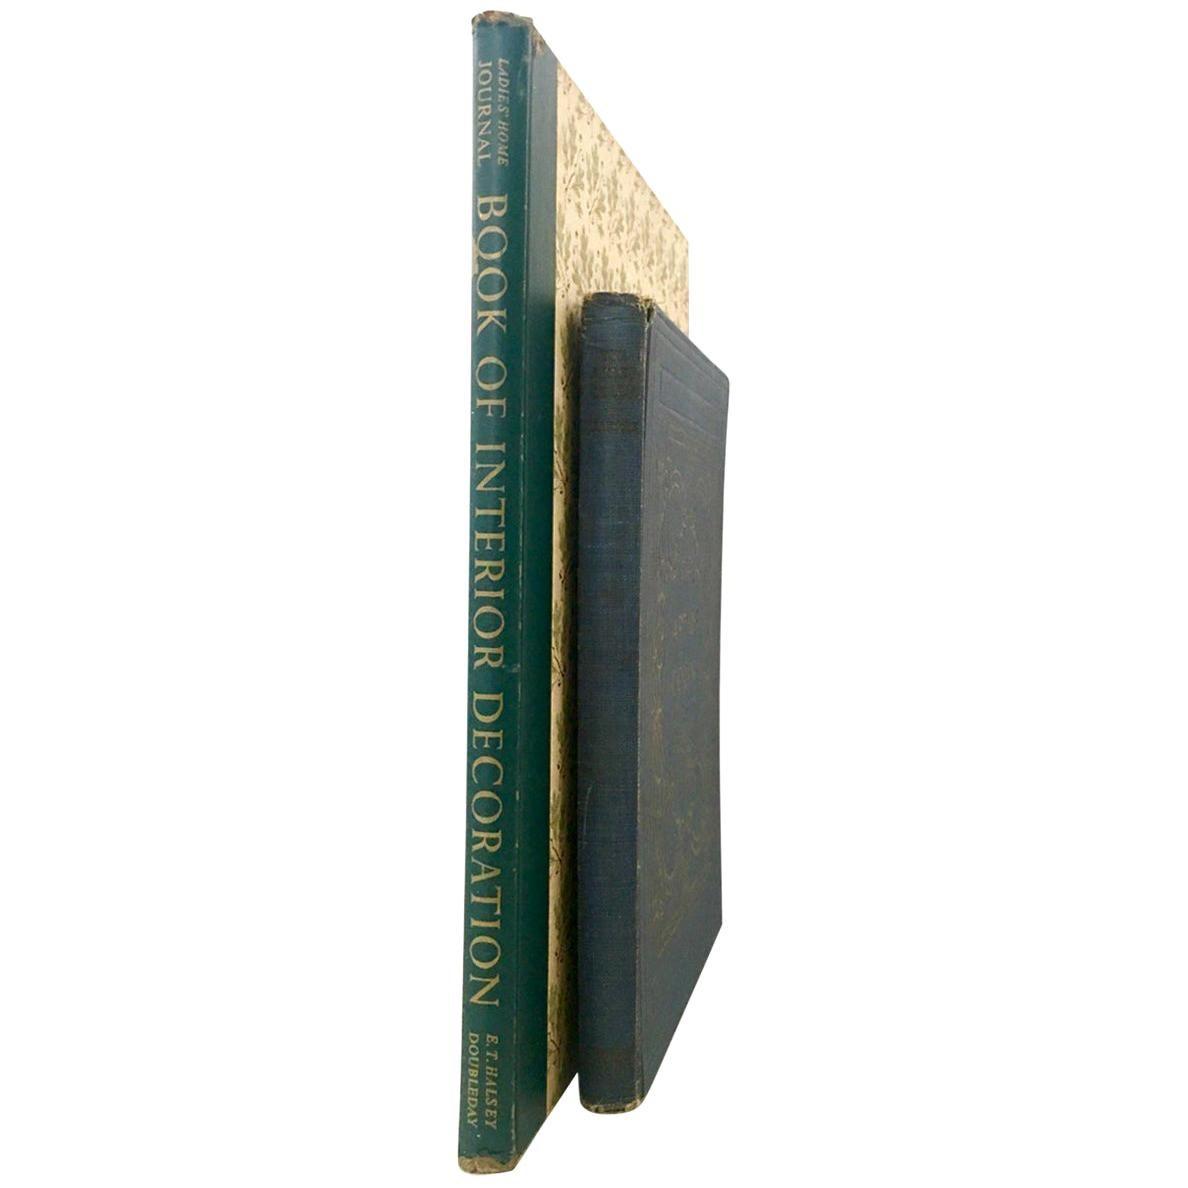 Mid-20th Century First Edition Interior Design Books Set of 2